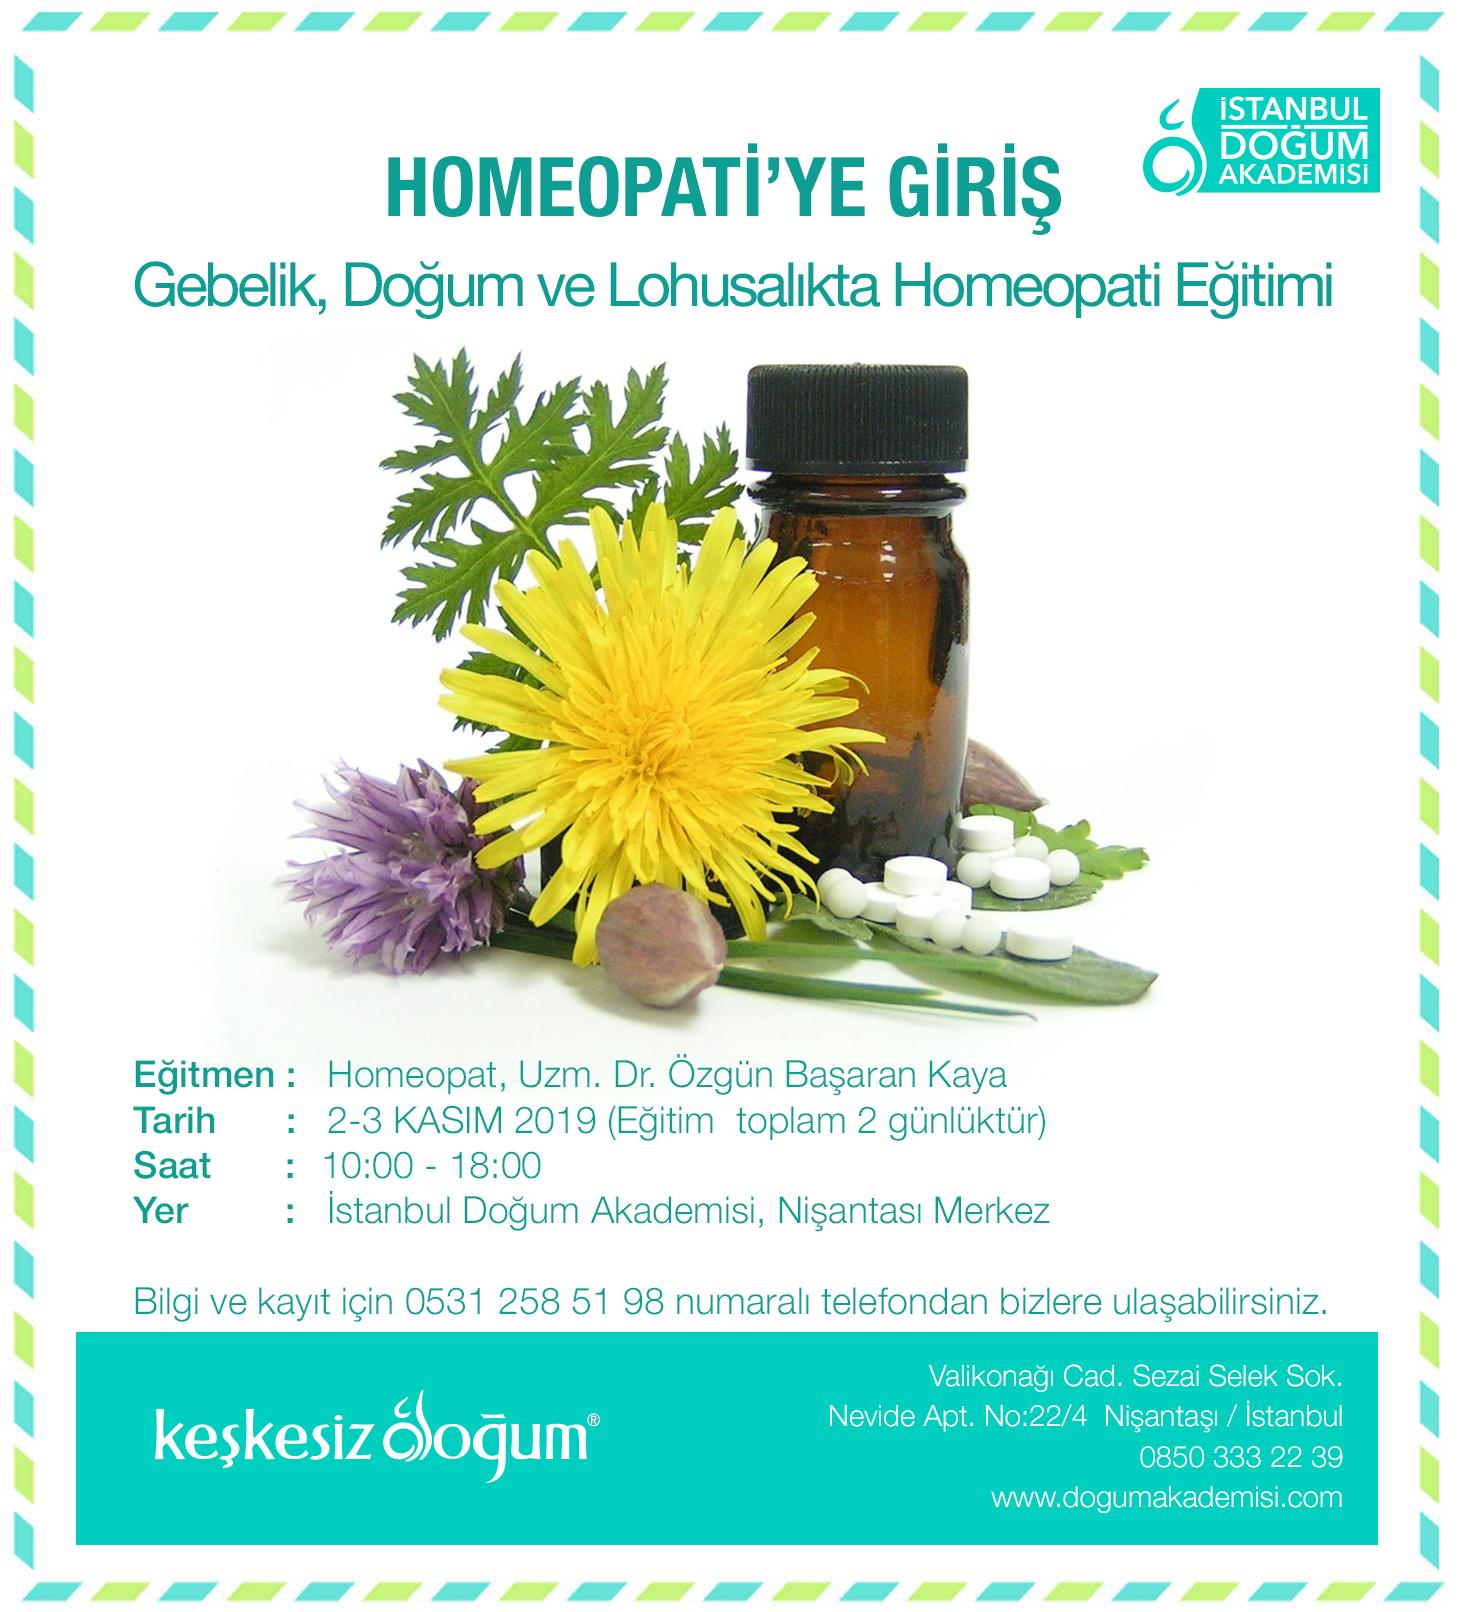 Homeopati'ye Giriş Eğitimi